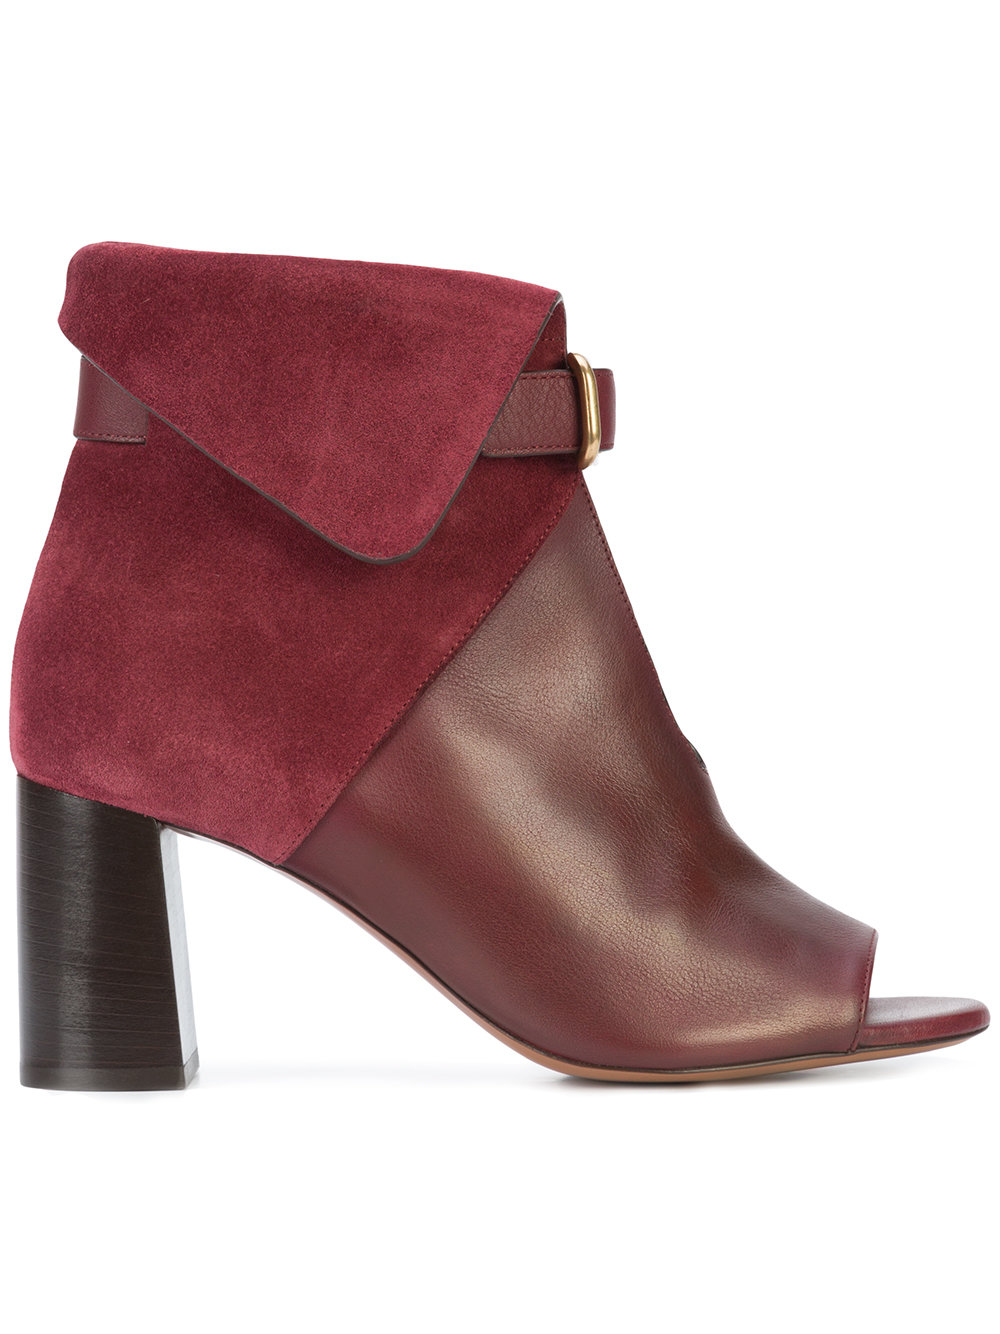 CHLOÉ boots - $995